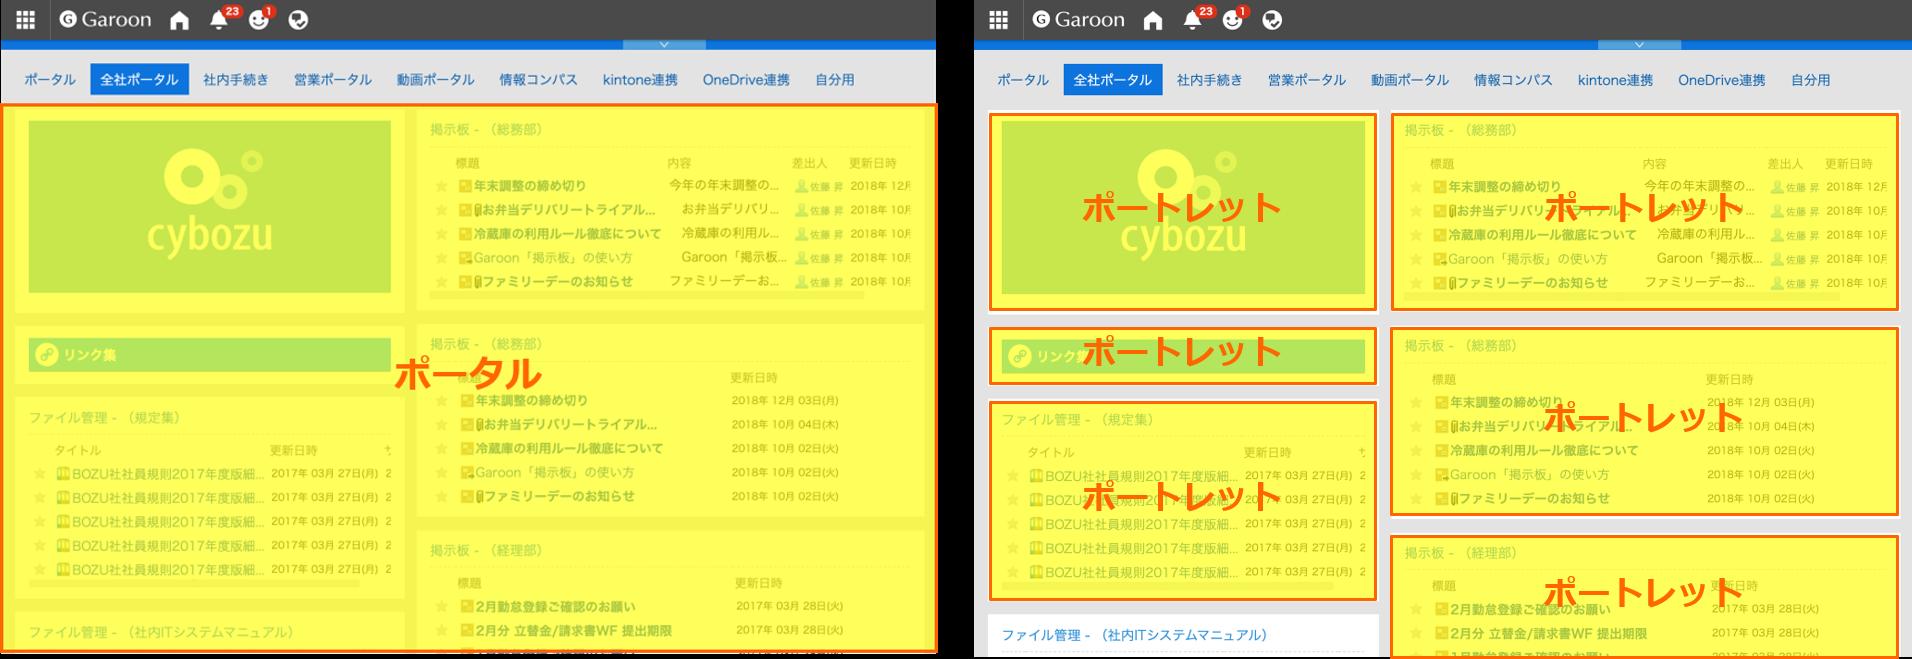 https://enterprise.cybozu.co.jp/b677966546245cebd376568863178d601bf10ebb.png